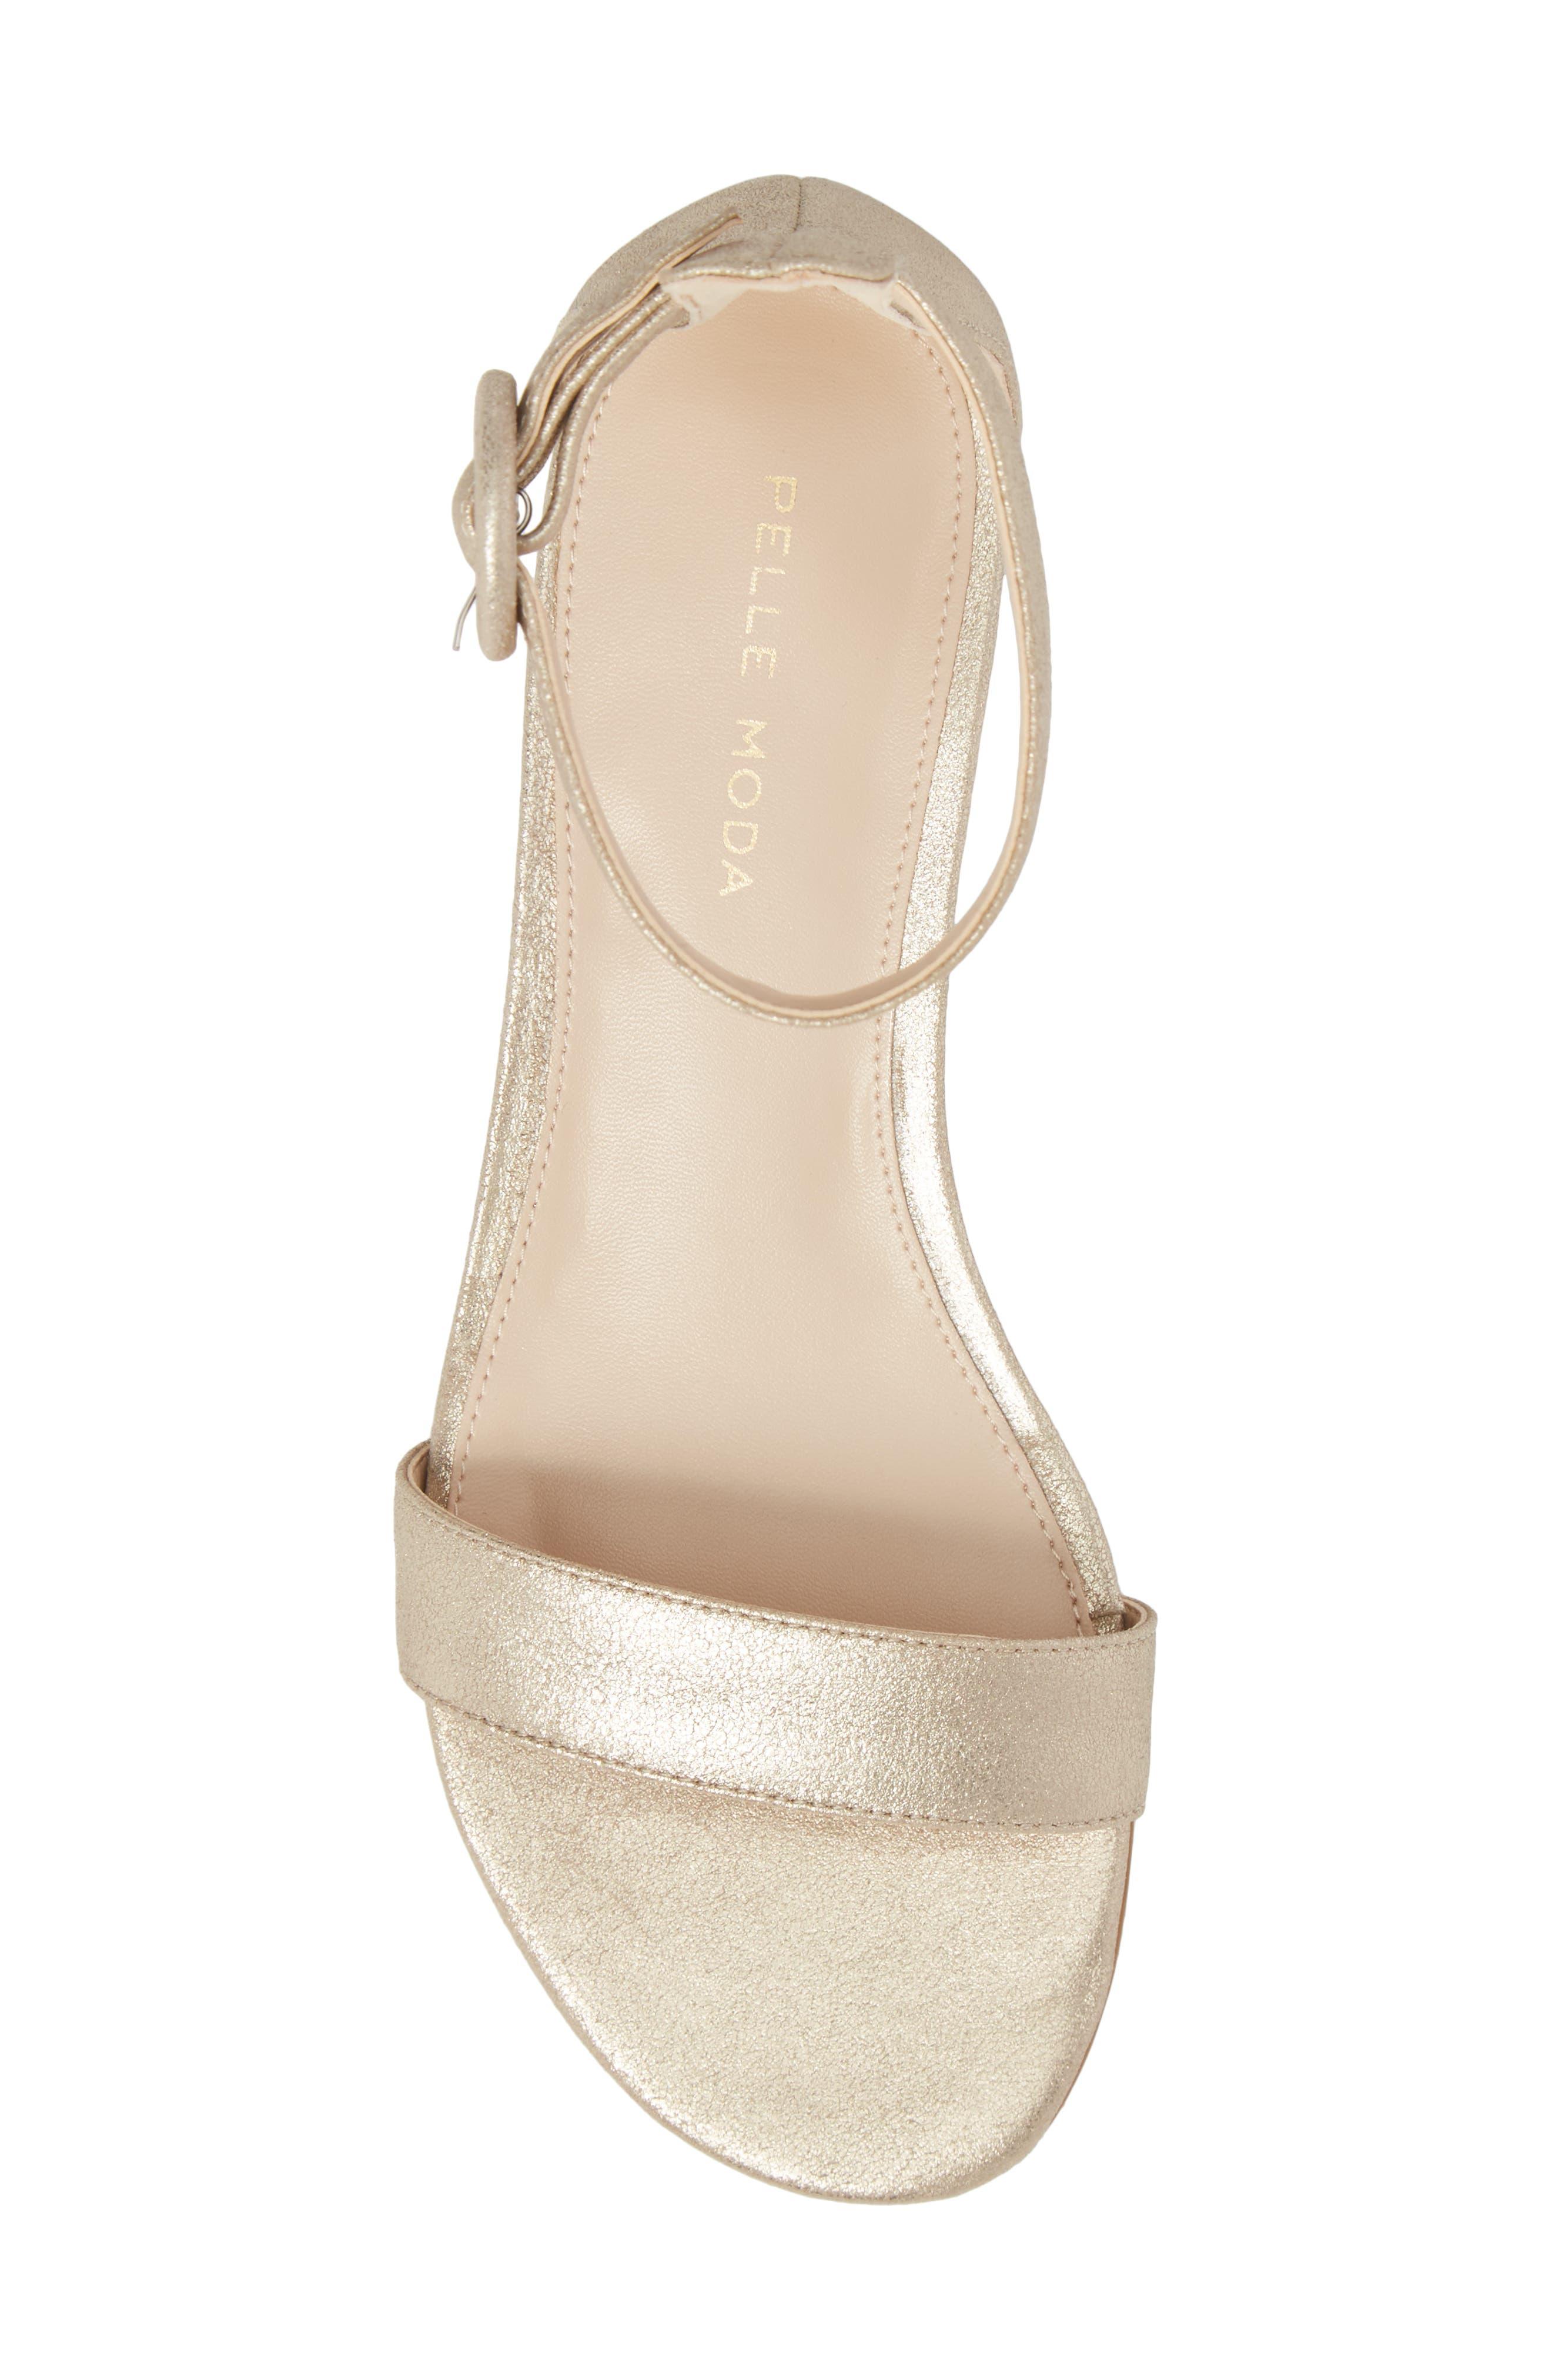 Newport Sandal,                             Alternate thumbnail 5, color,                             Platinum Gold Metallic Suede